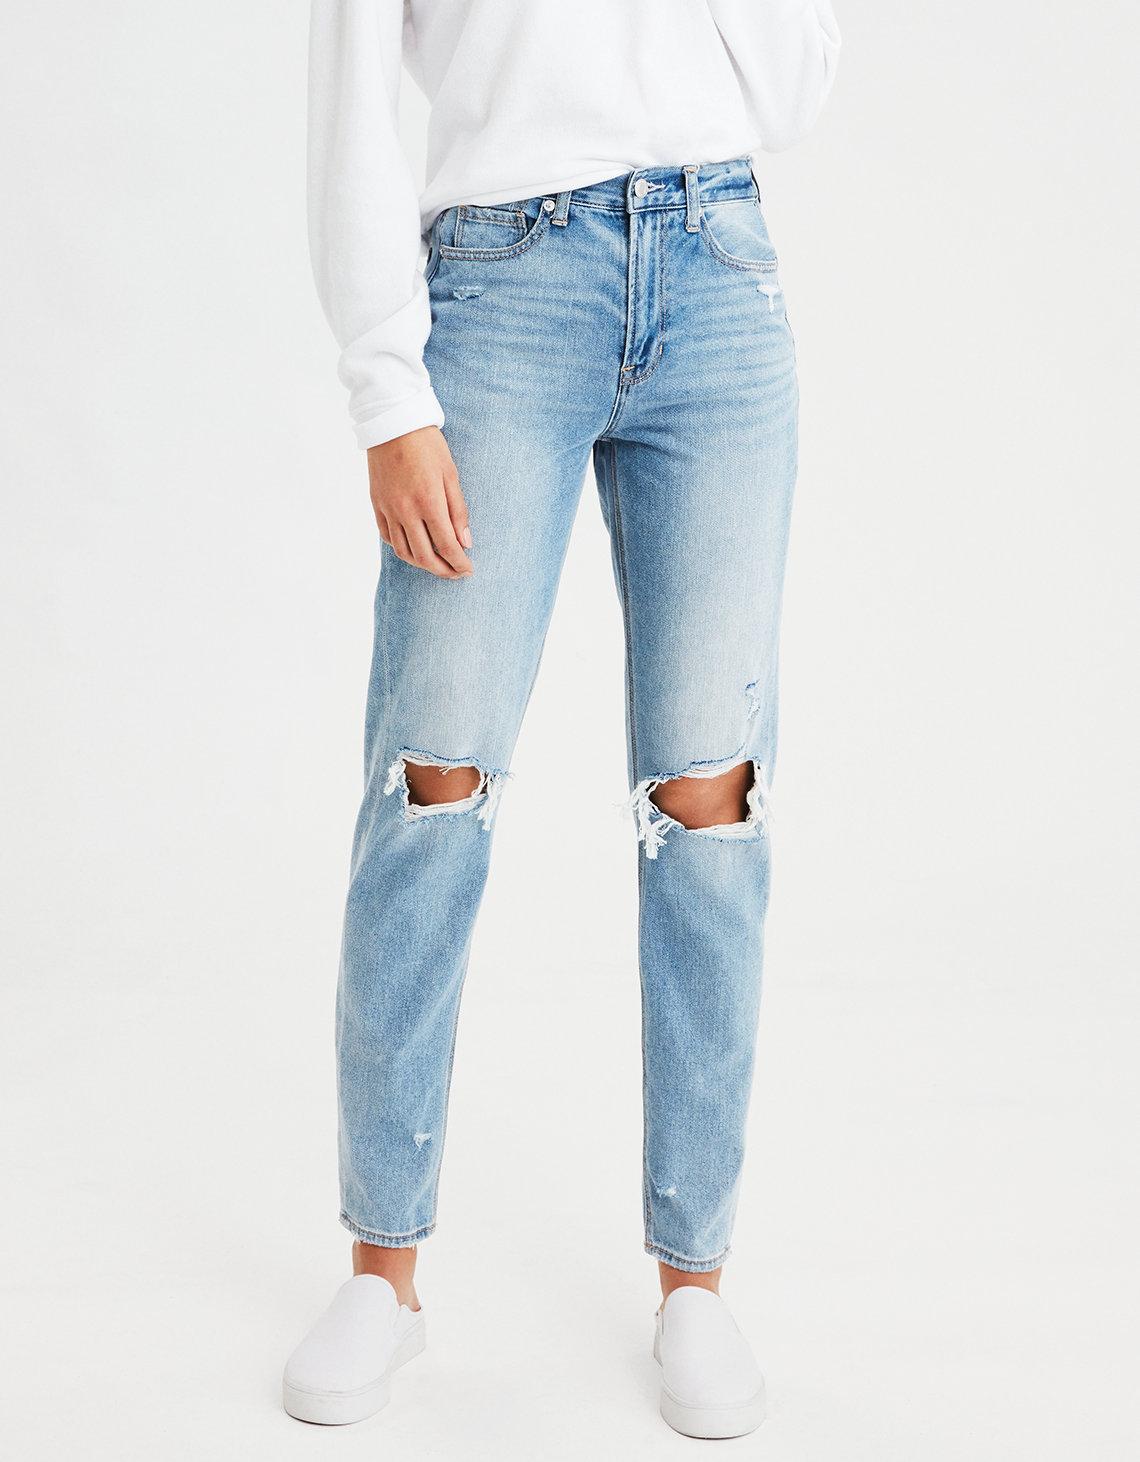 AE mom jeans.jpg